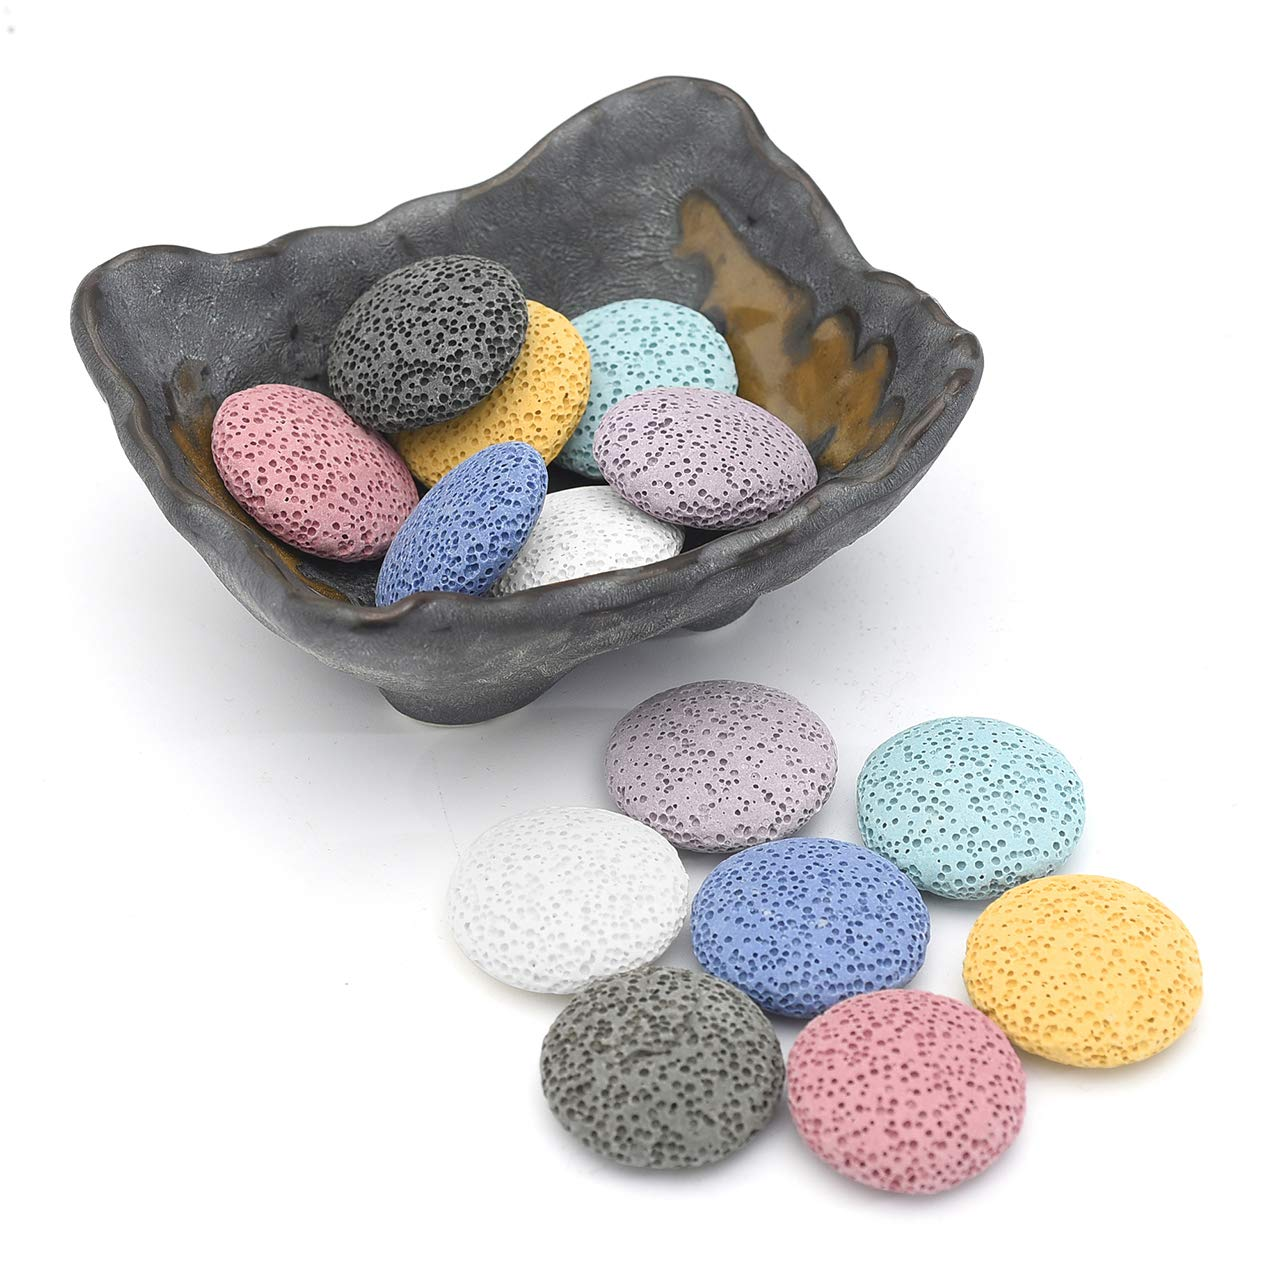 JOVIVI Aromatherapy Essential Oil Diffuser Home Decoration Set - 14pcs Lava Stone Beads & Vintage Irregualr Ceramic Essential Oil Holder Bowl